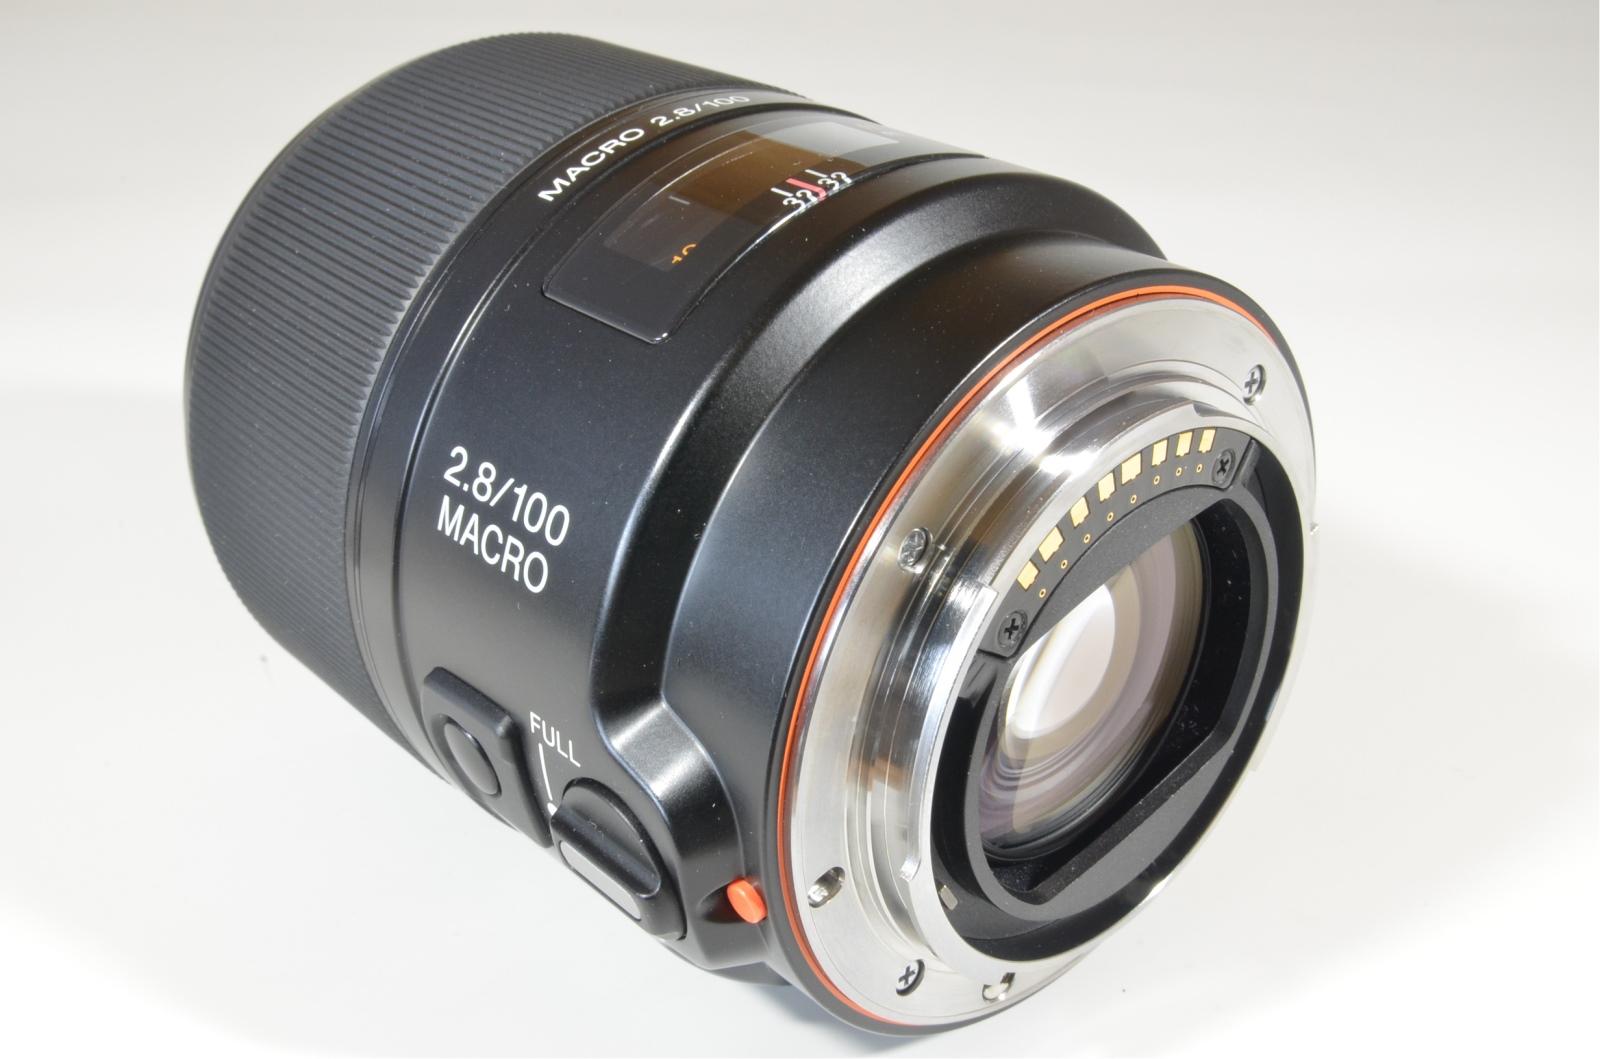 sony macro 100mm f2.8